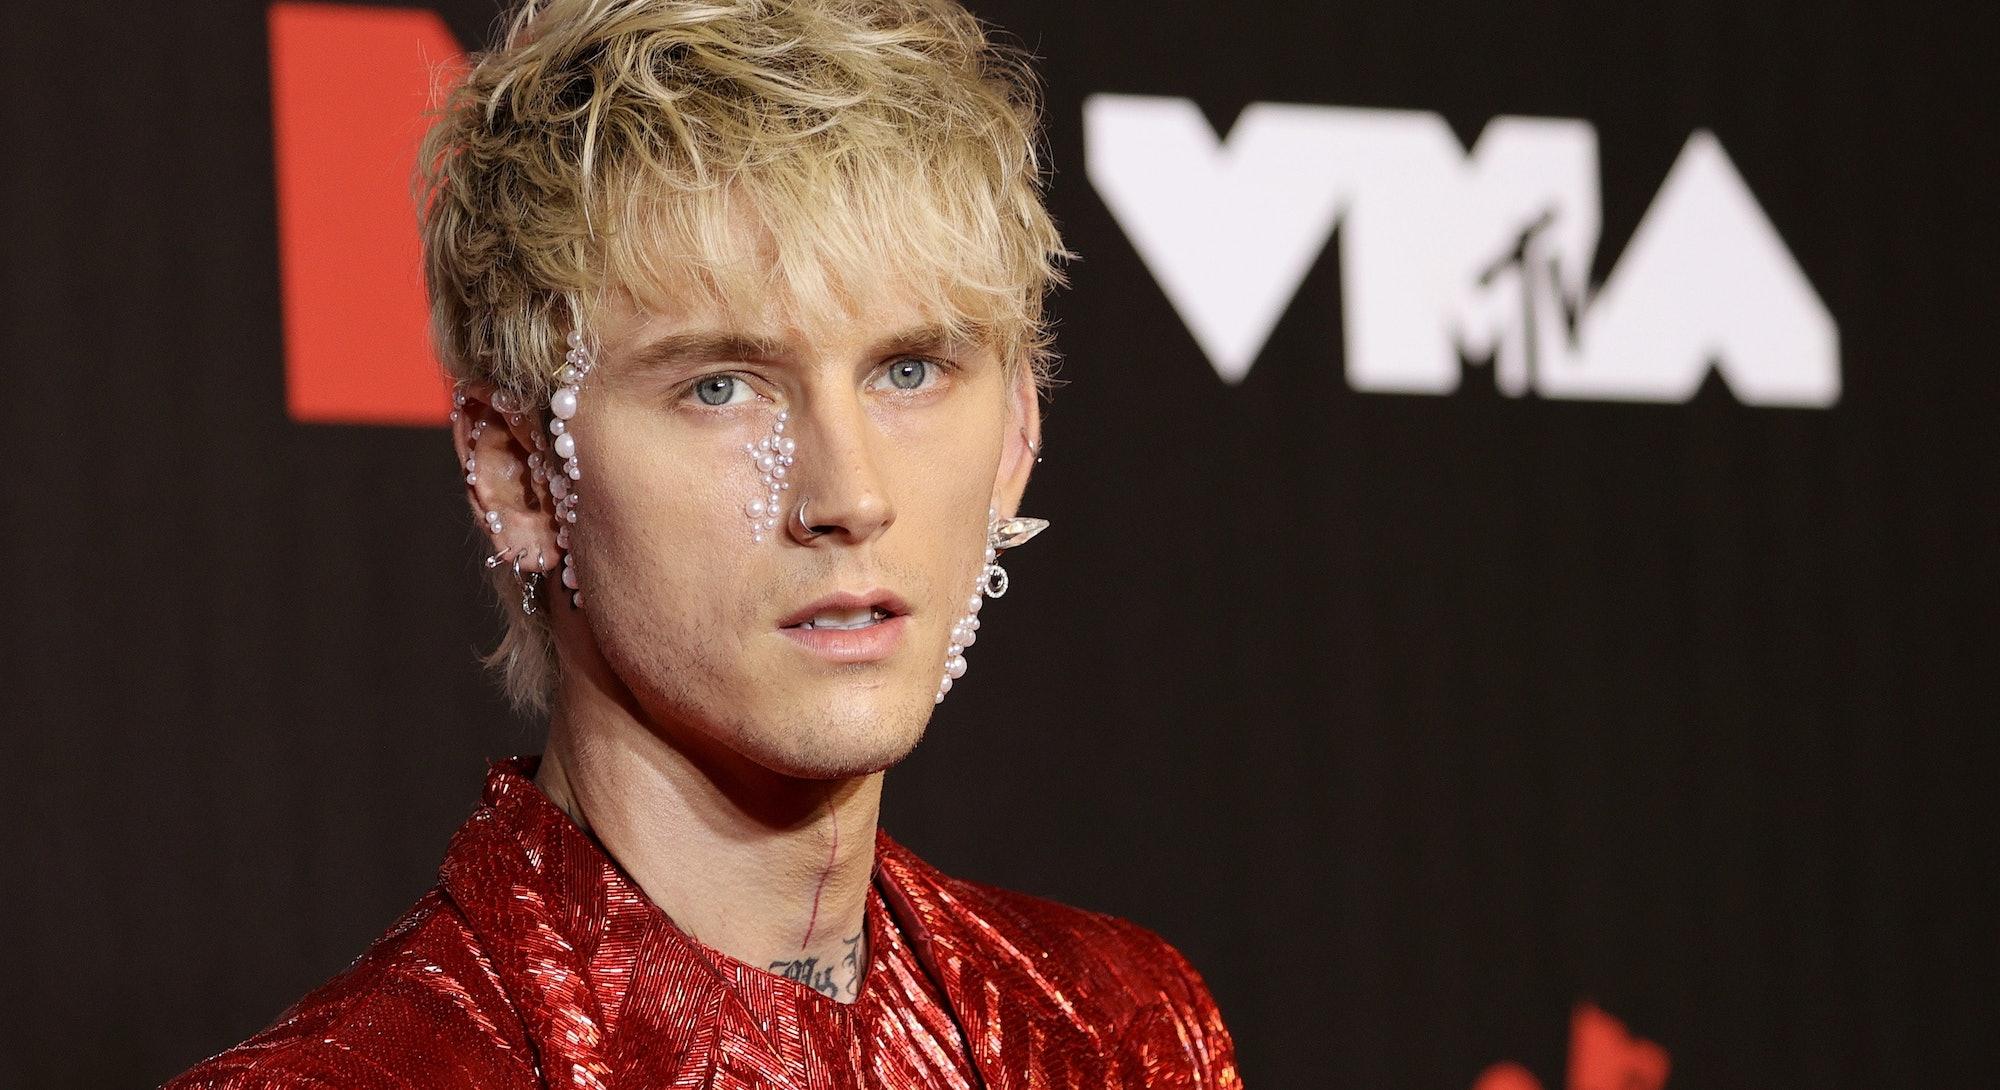 NEW YORK, NEW YORK - SEPTEMBER 12: Machine Gun Kelly attends the 2021 MTV Video Music Awards at Barc...